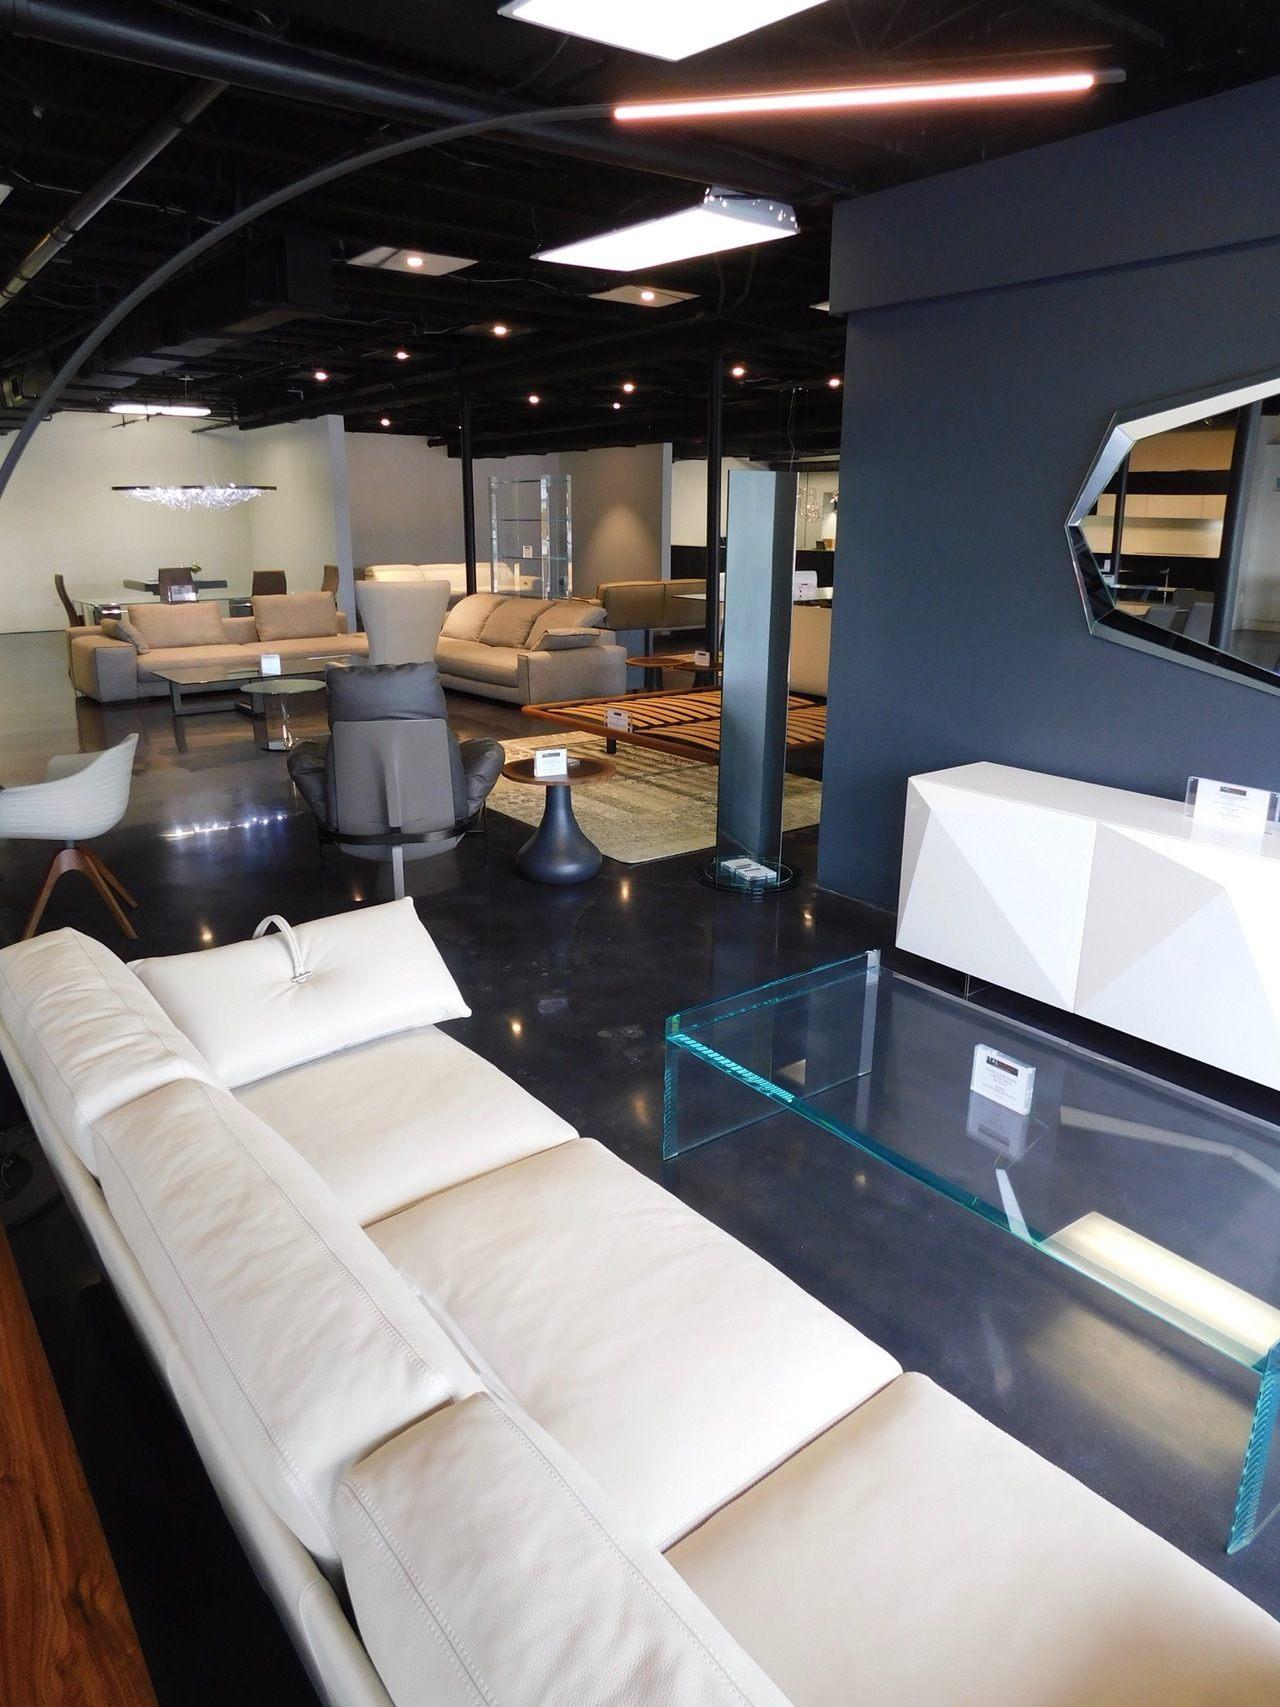 meubles portes placards cuisine salon salle de bain miami fortlauderdale floride italkraft mia. Black Bedroom Furniture Sets. Home Design Ideas